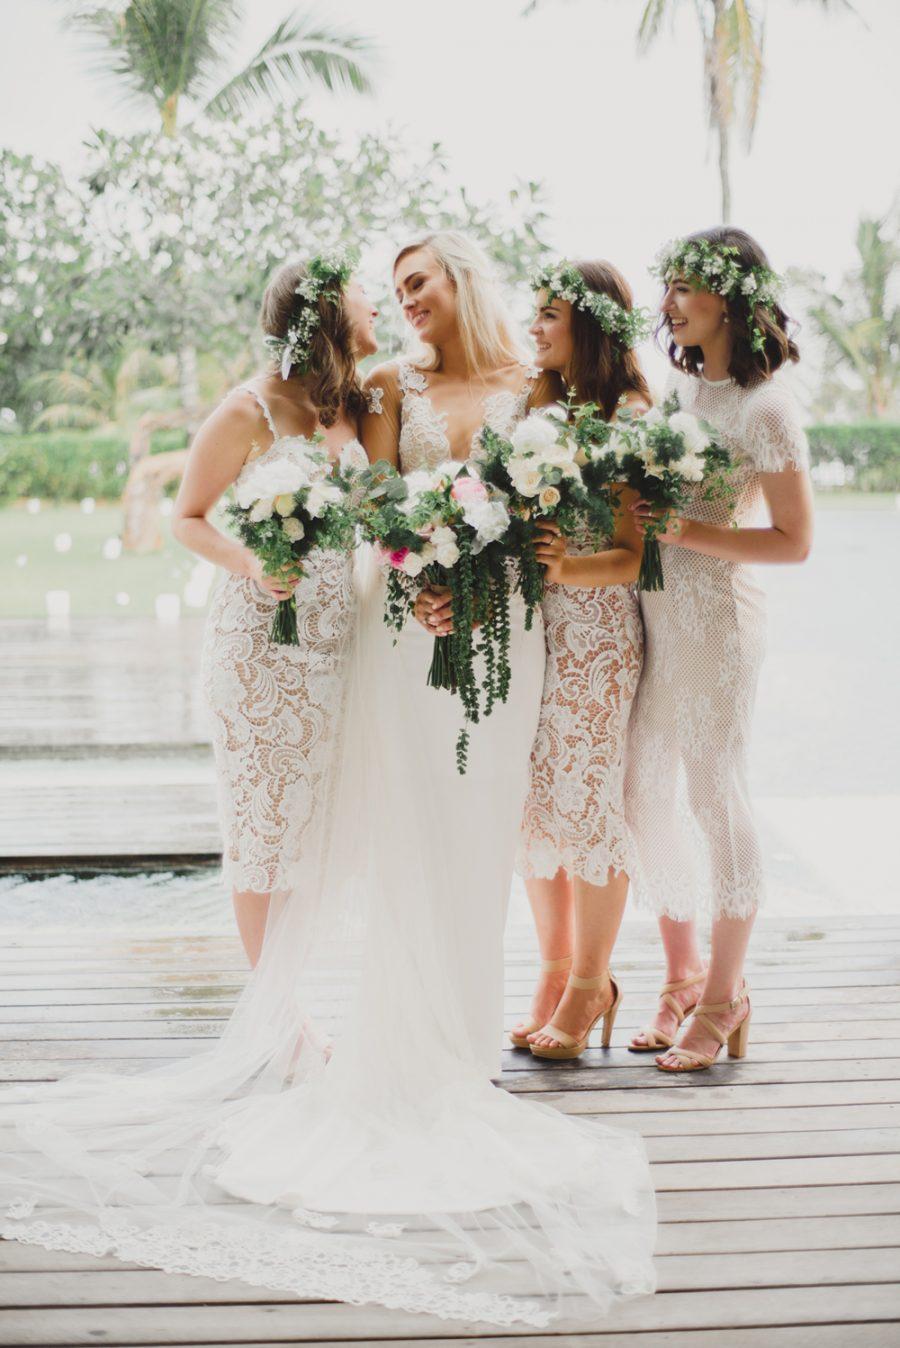 Mismatched White Lace Boho Bridesmaid Dresses  SouthBound